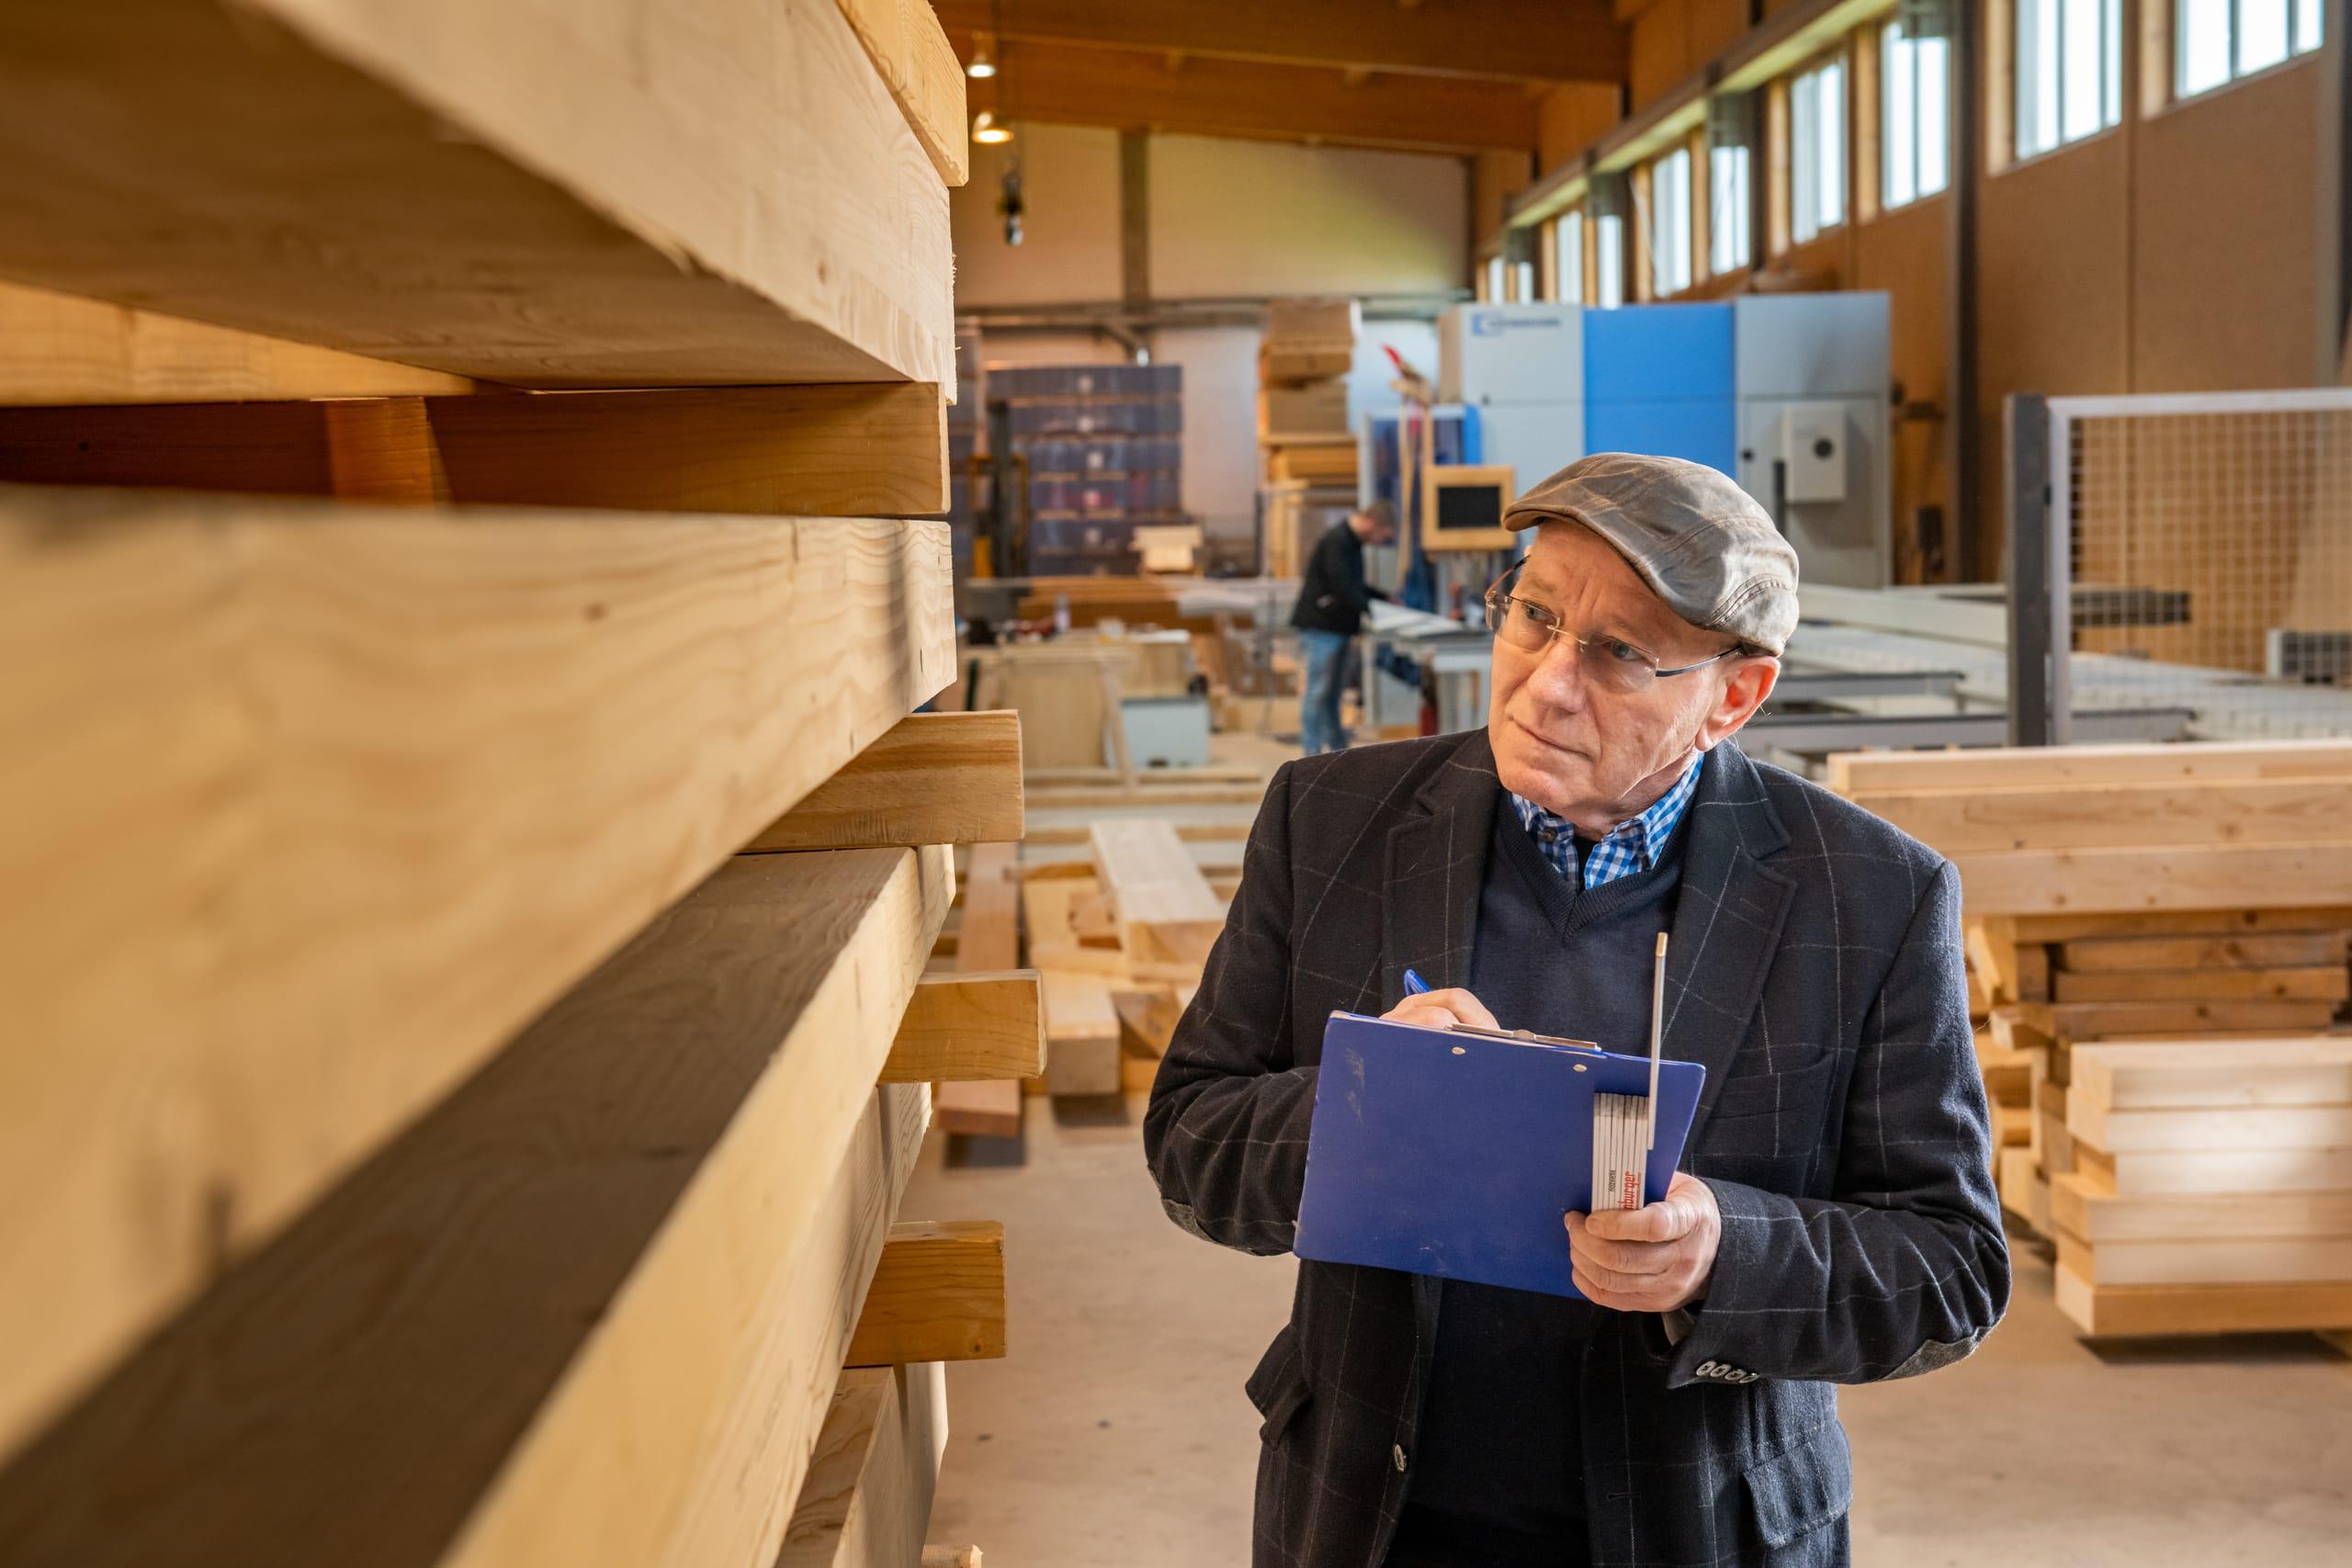 Lieferengpass am Bau treibt Betriebe in Kurzarbeit